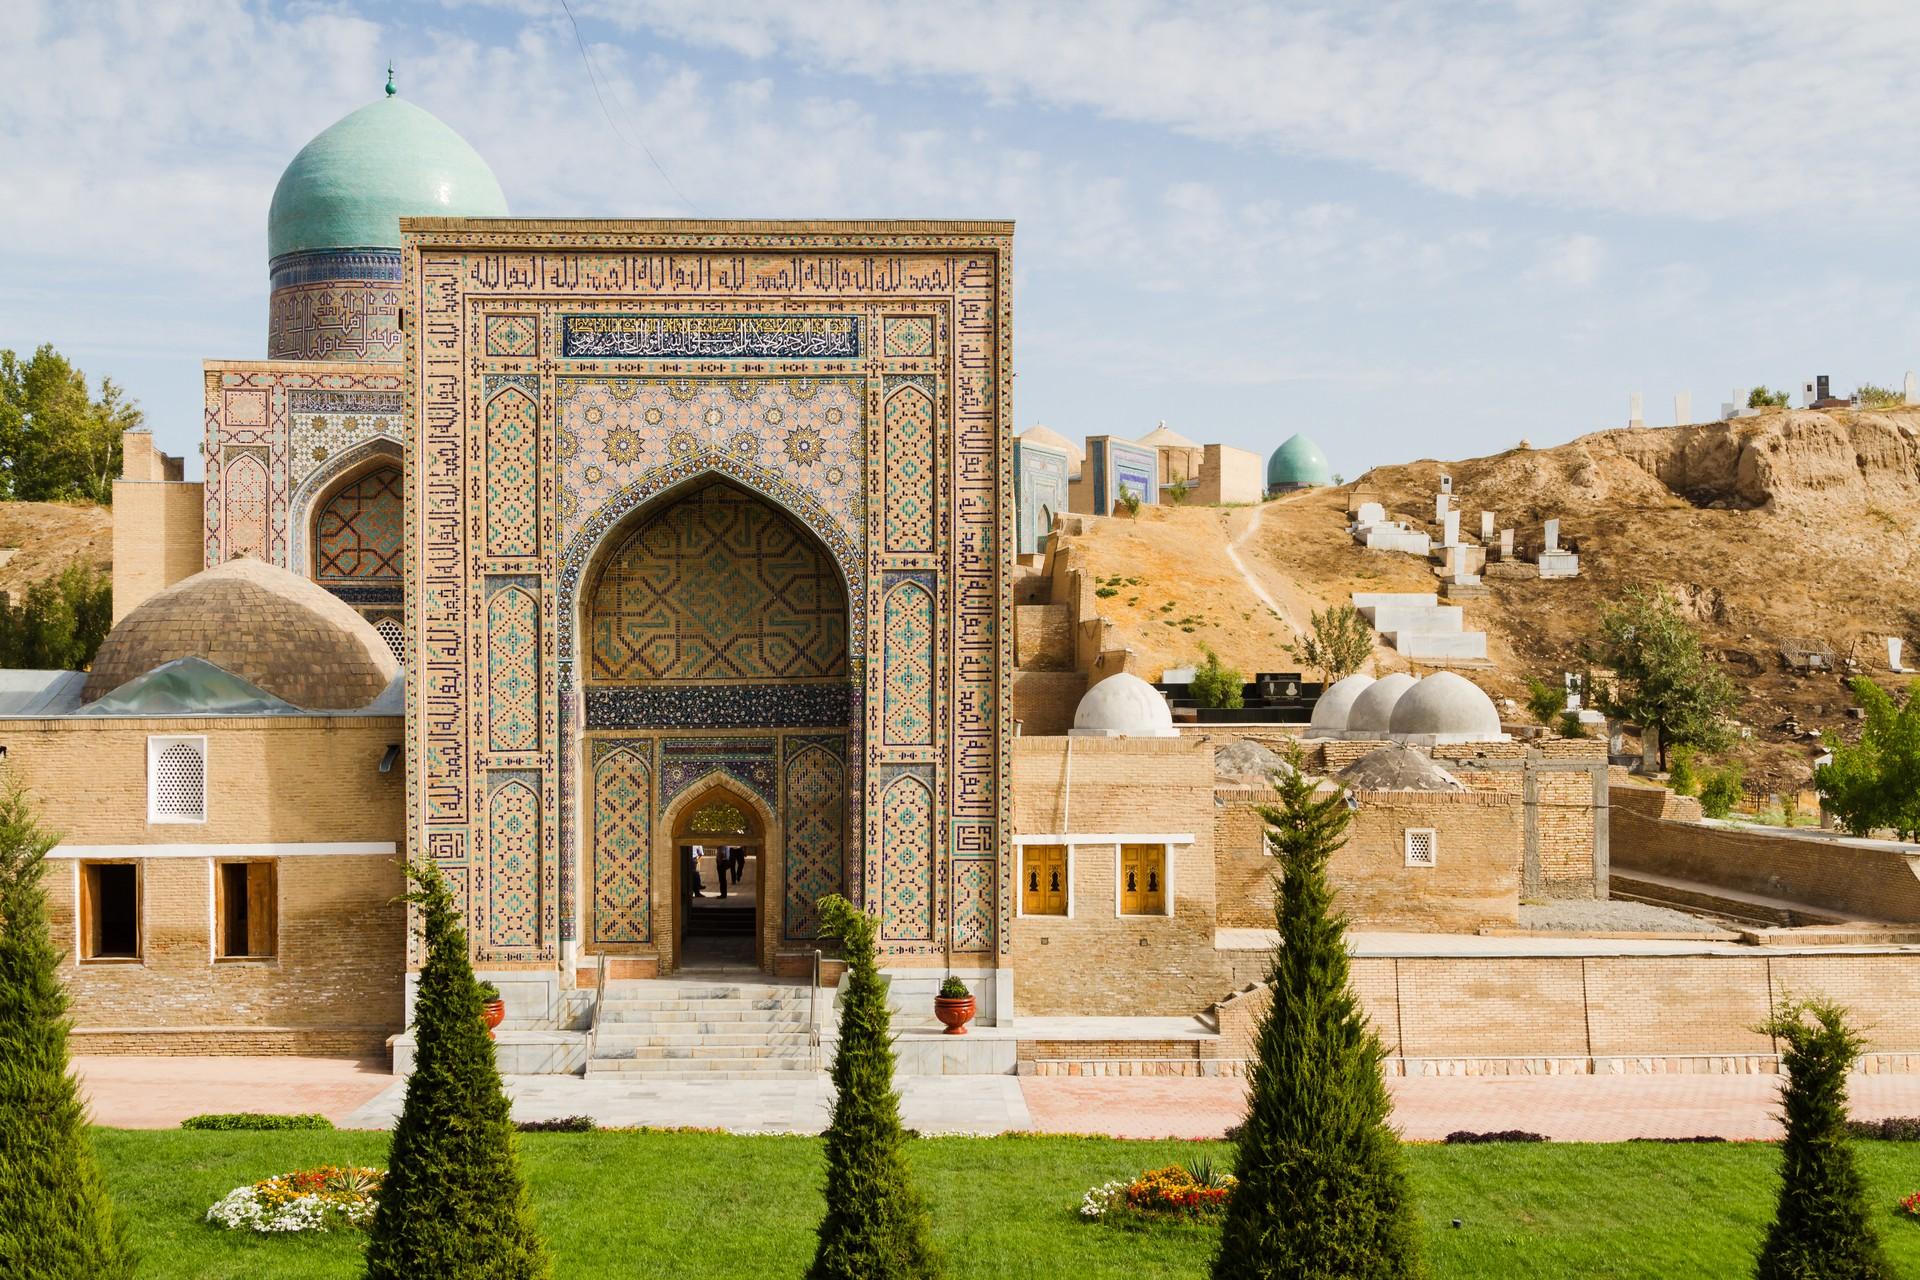 Samarkand, Uzbekistan area of the Silk Route